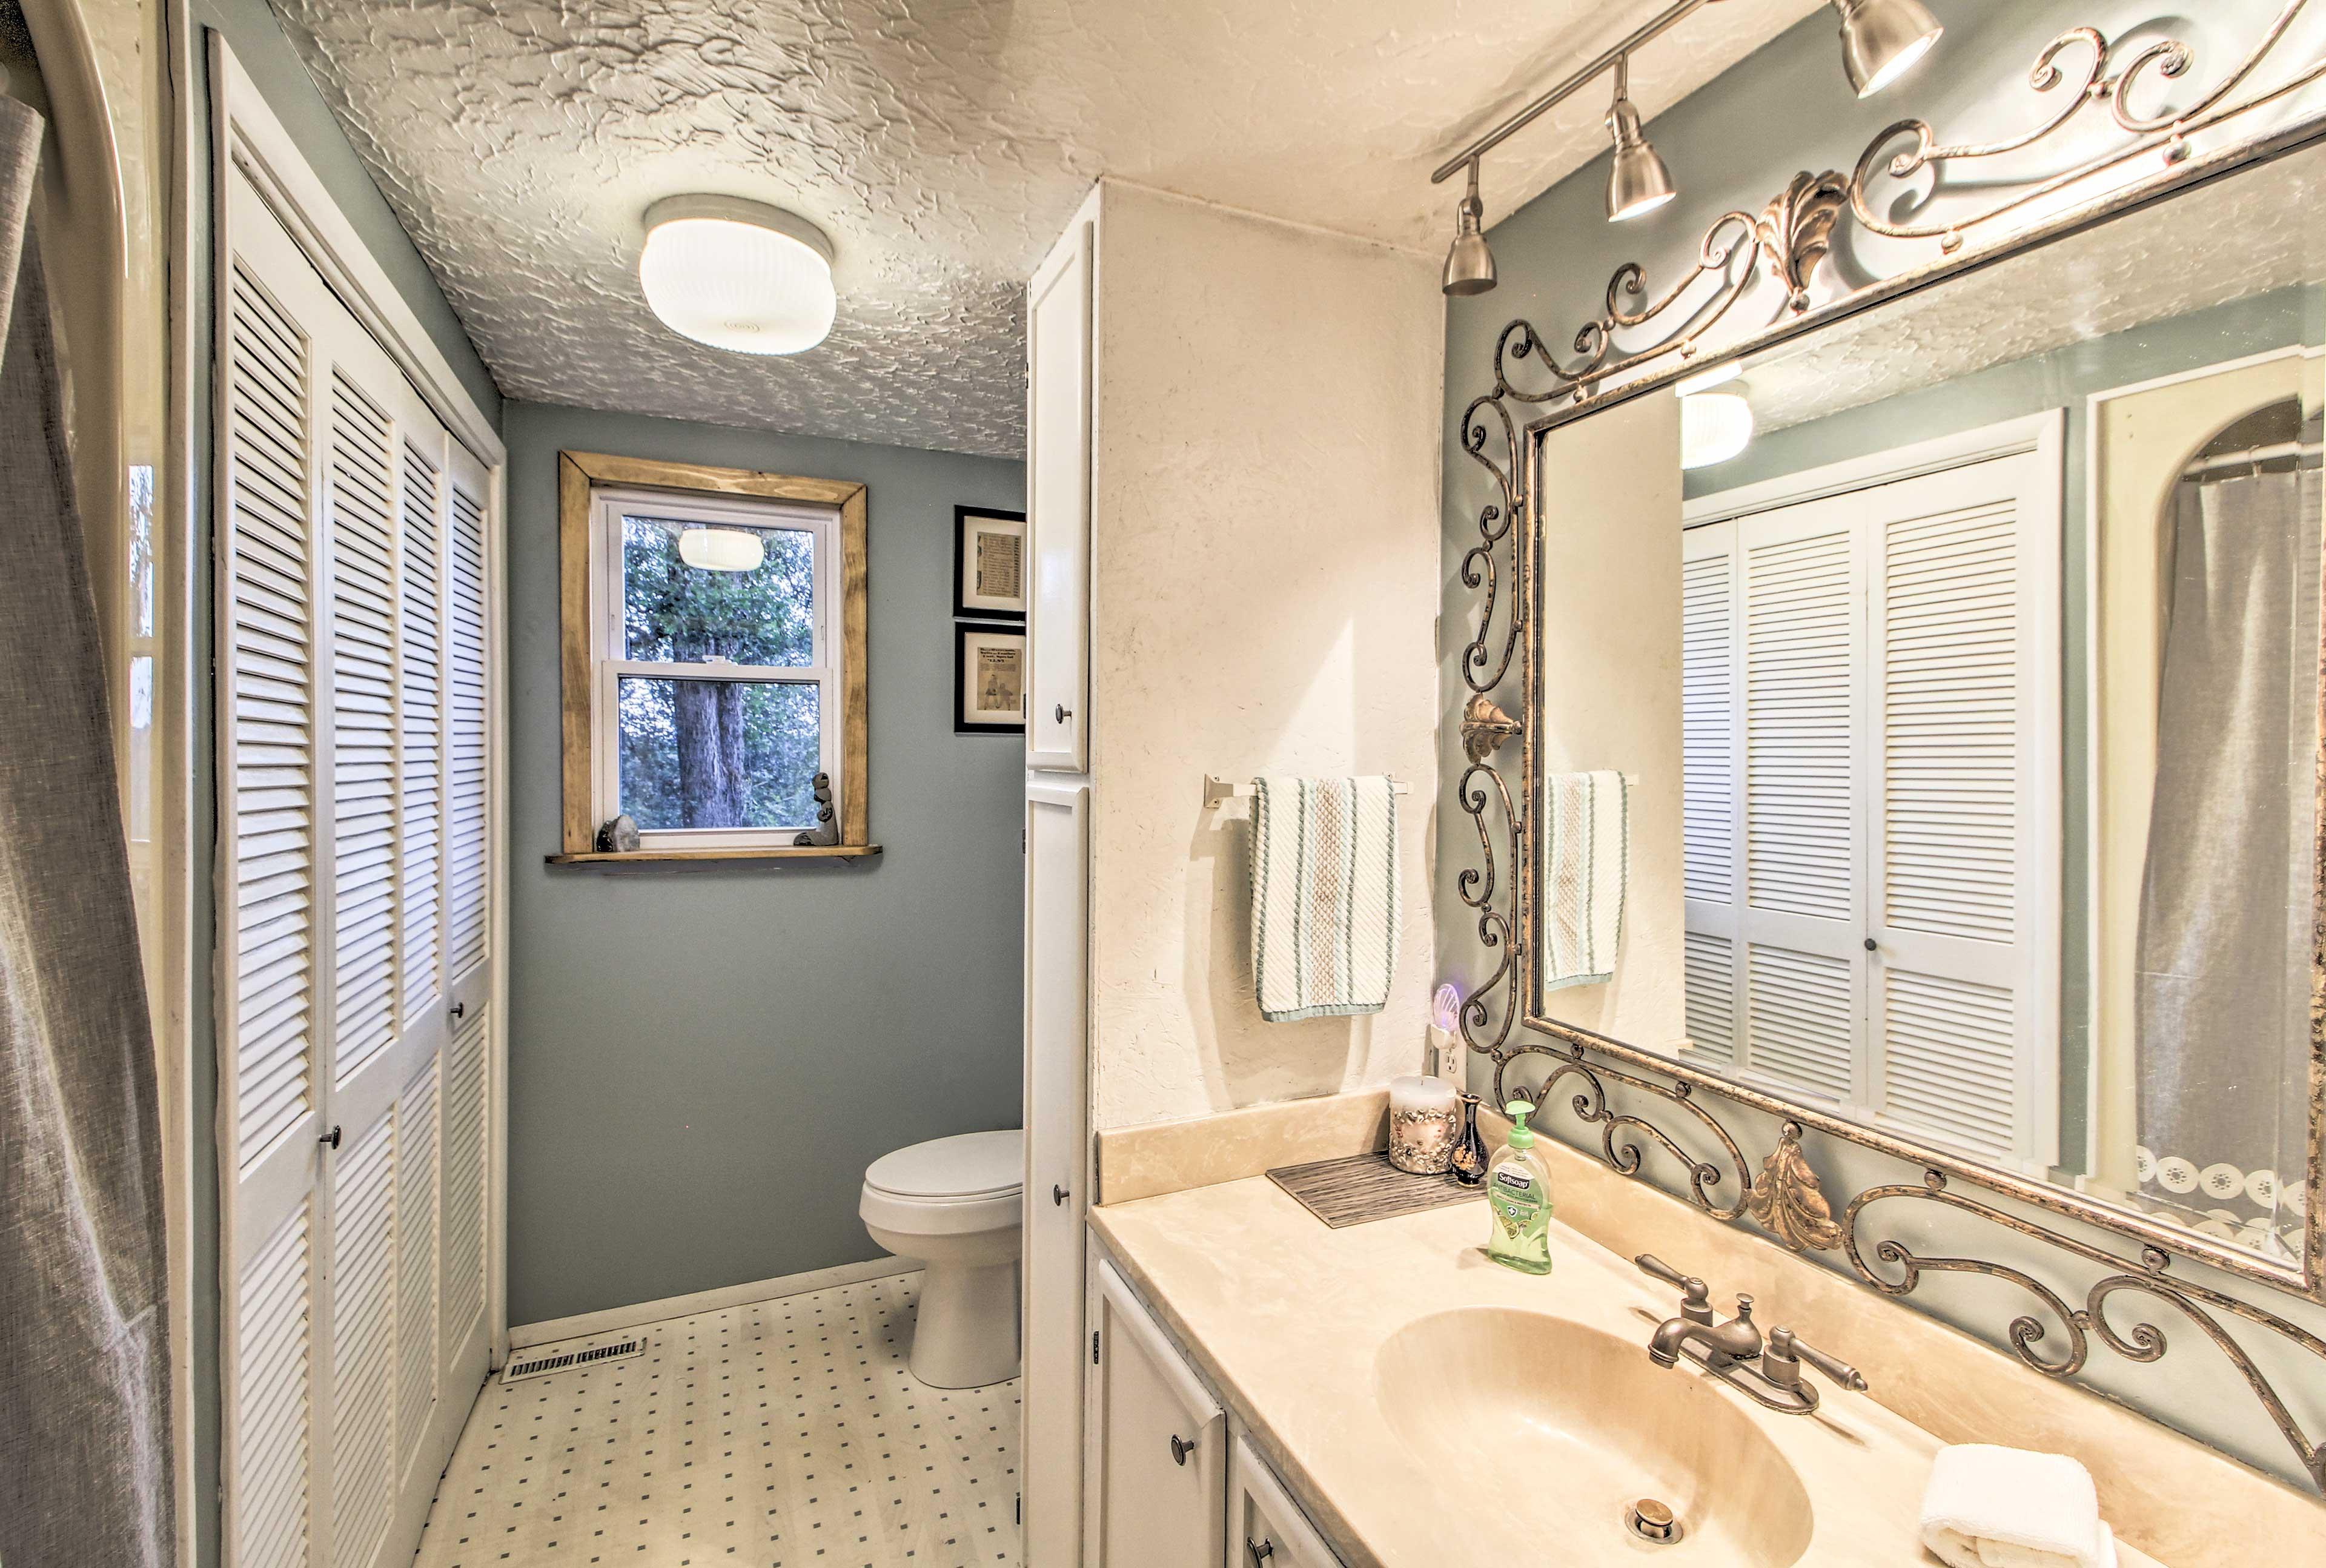 This bathroom has more than meets the eye.